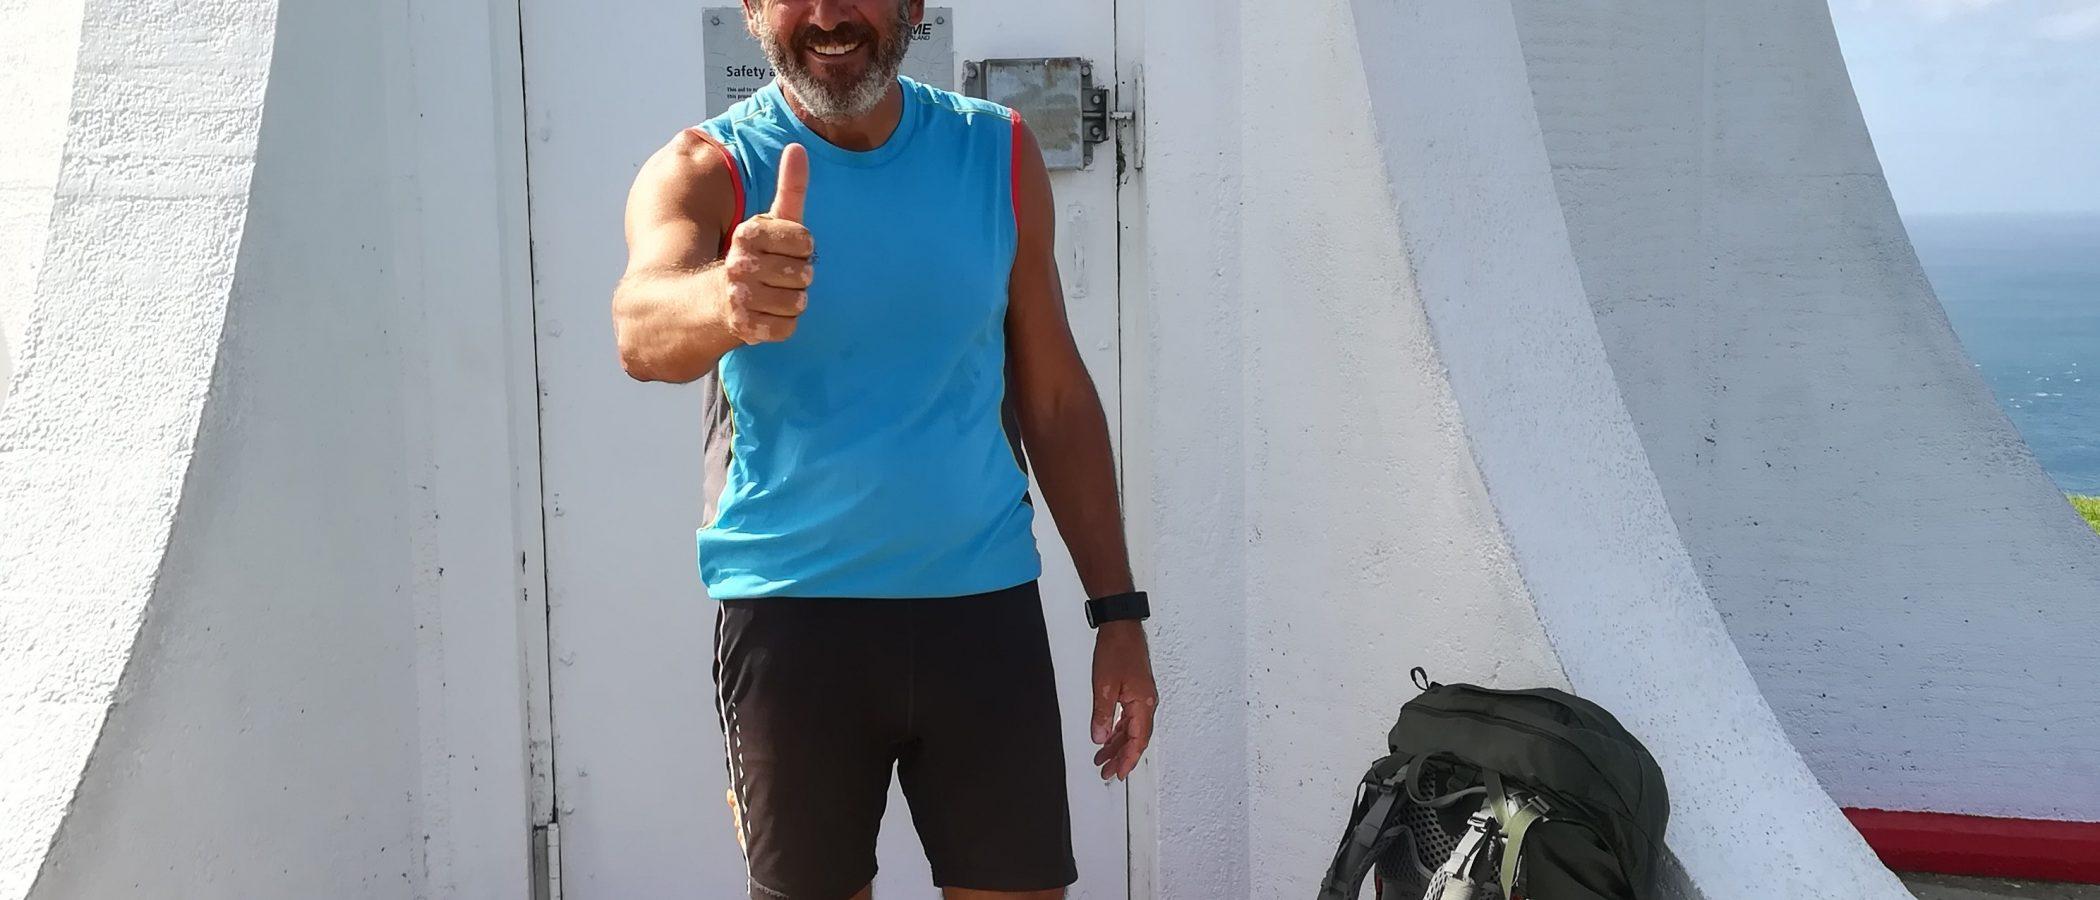 134 Tage und 3041 Km am Te Araroa Trail durch Neuseeland